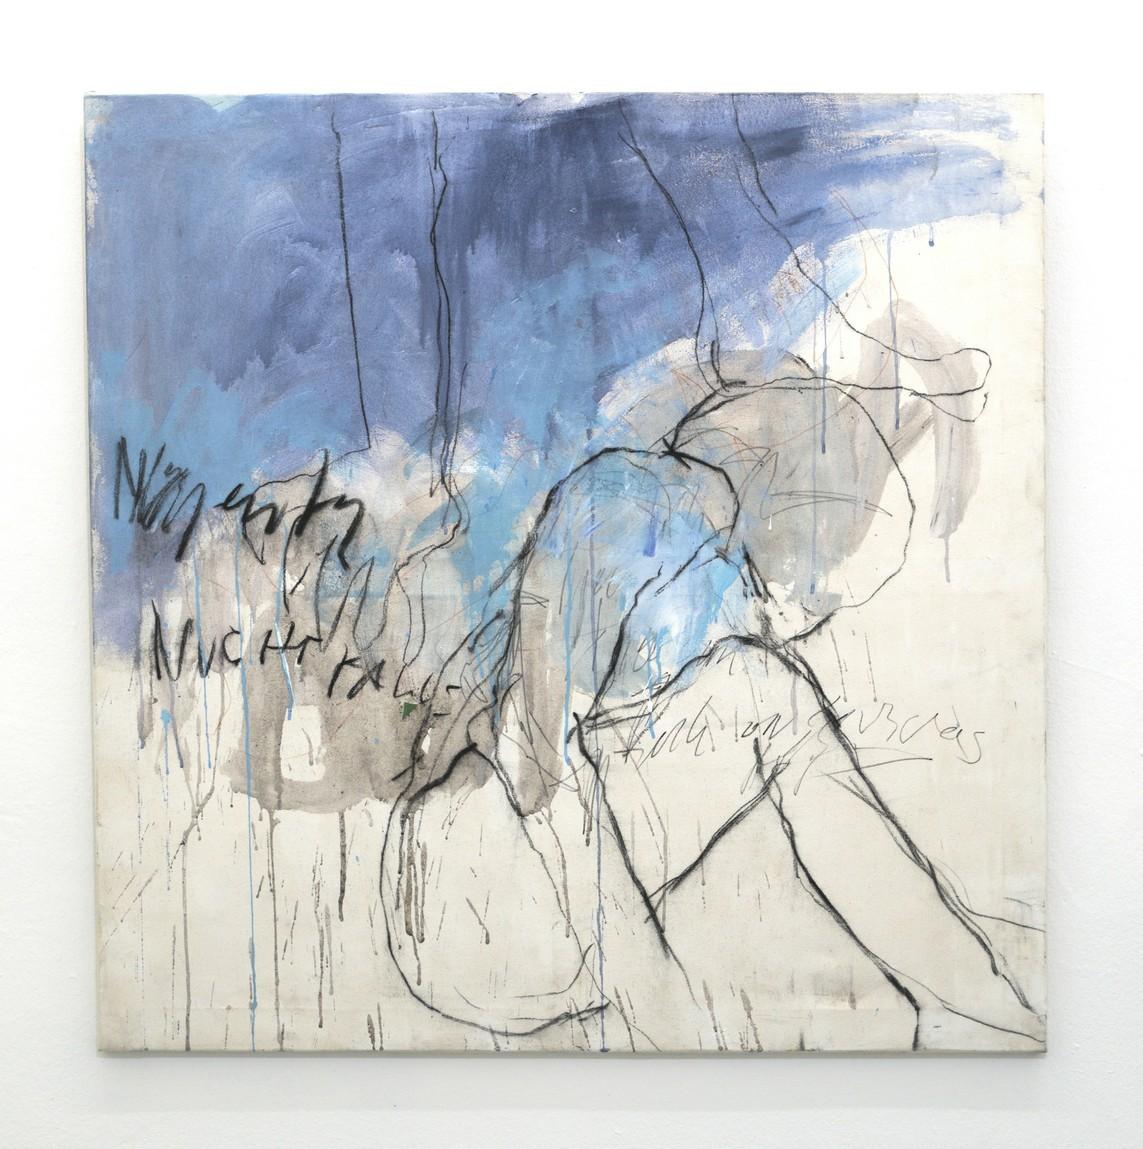 »Permeable self« 2017, Tinte und Kohle auf Leinwand, 100 x 100 cm